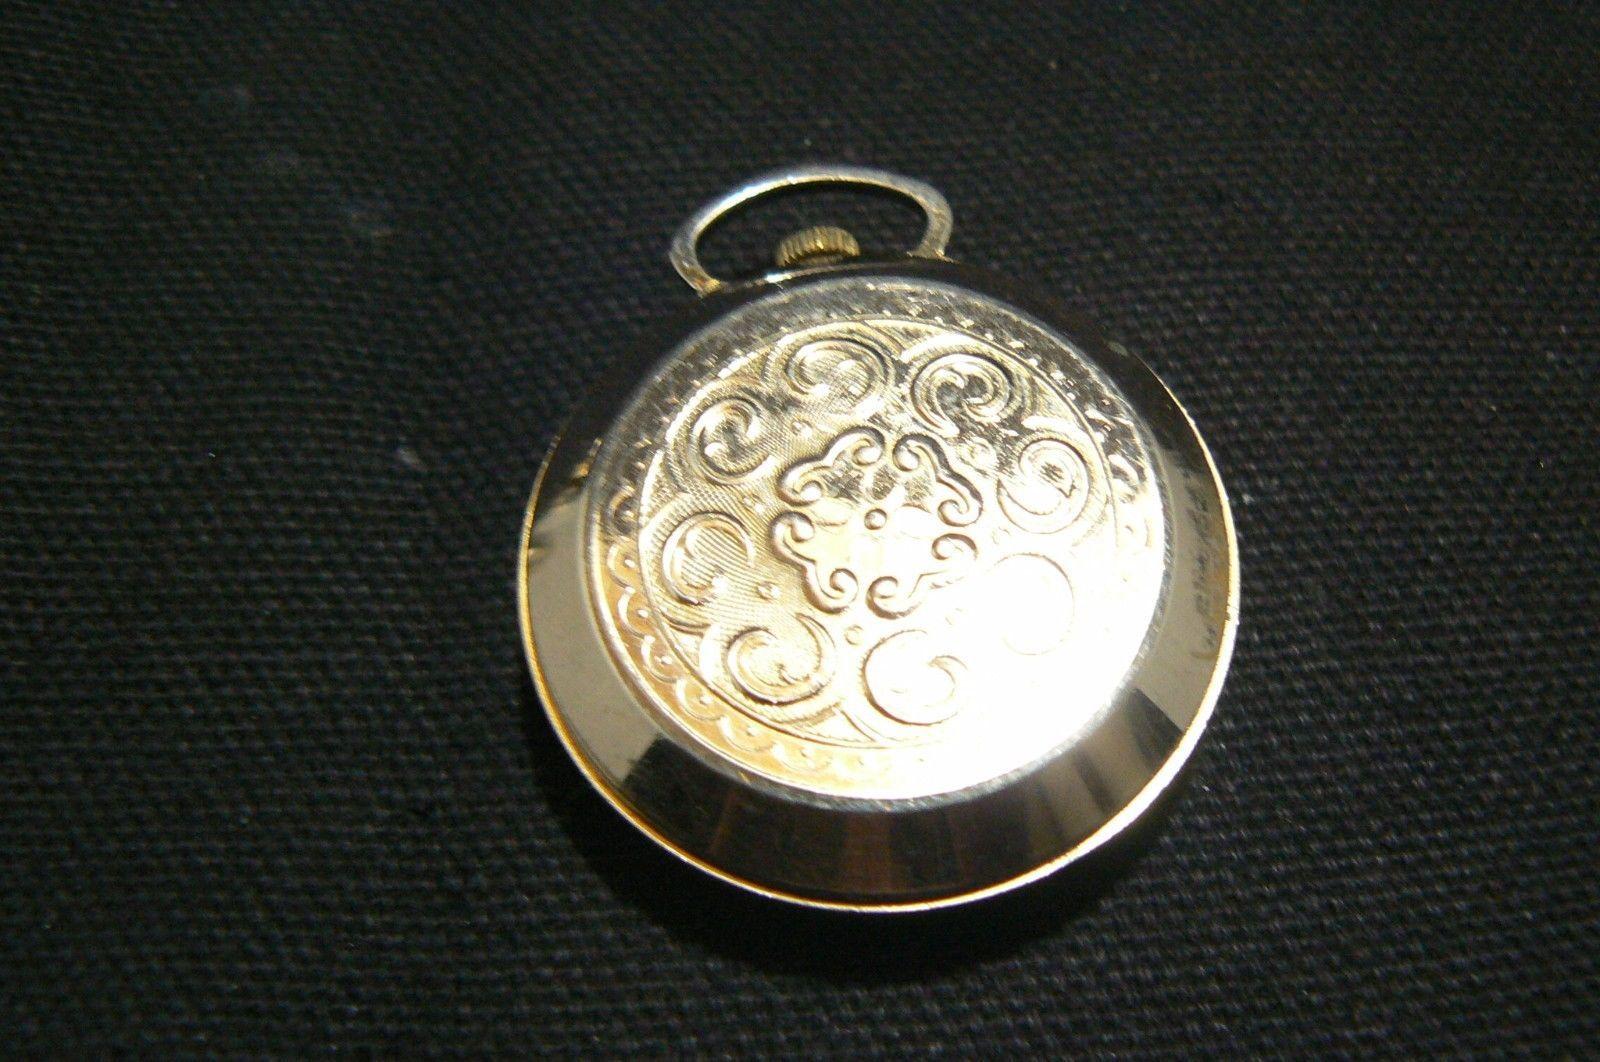 Beautiful Vintage Lantex Swiss Made Pocket Watch